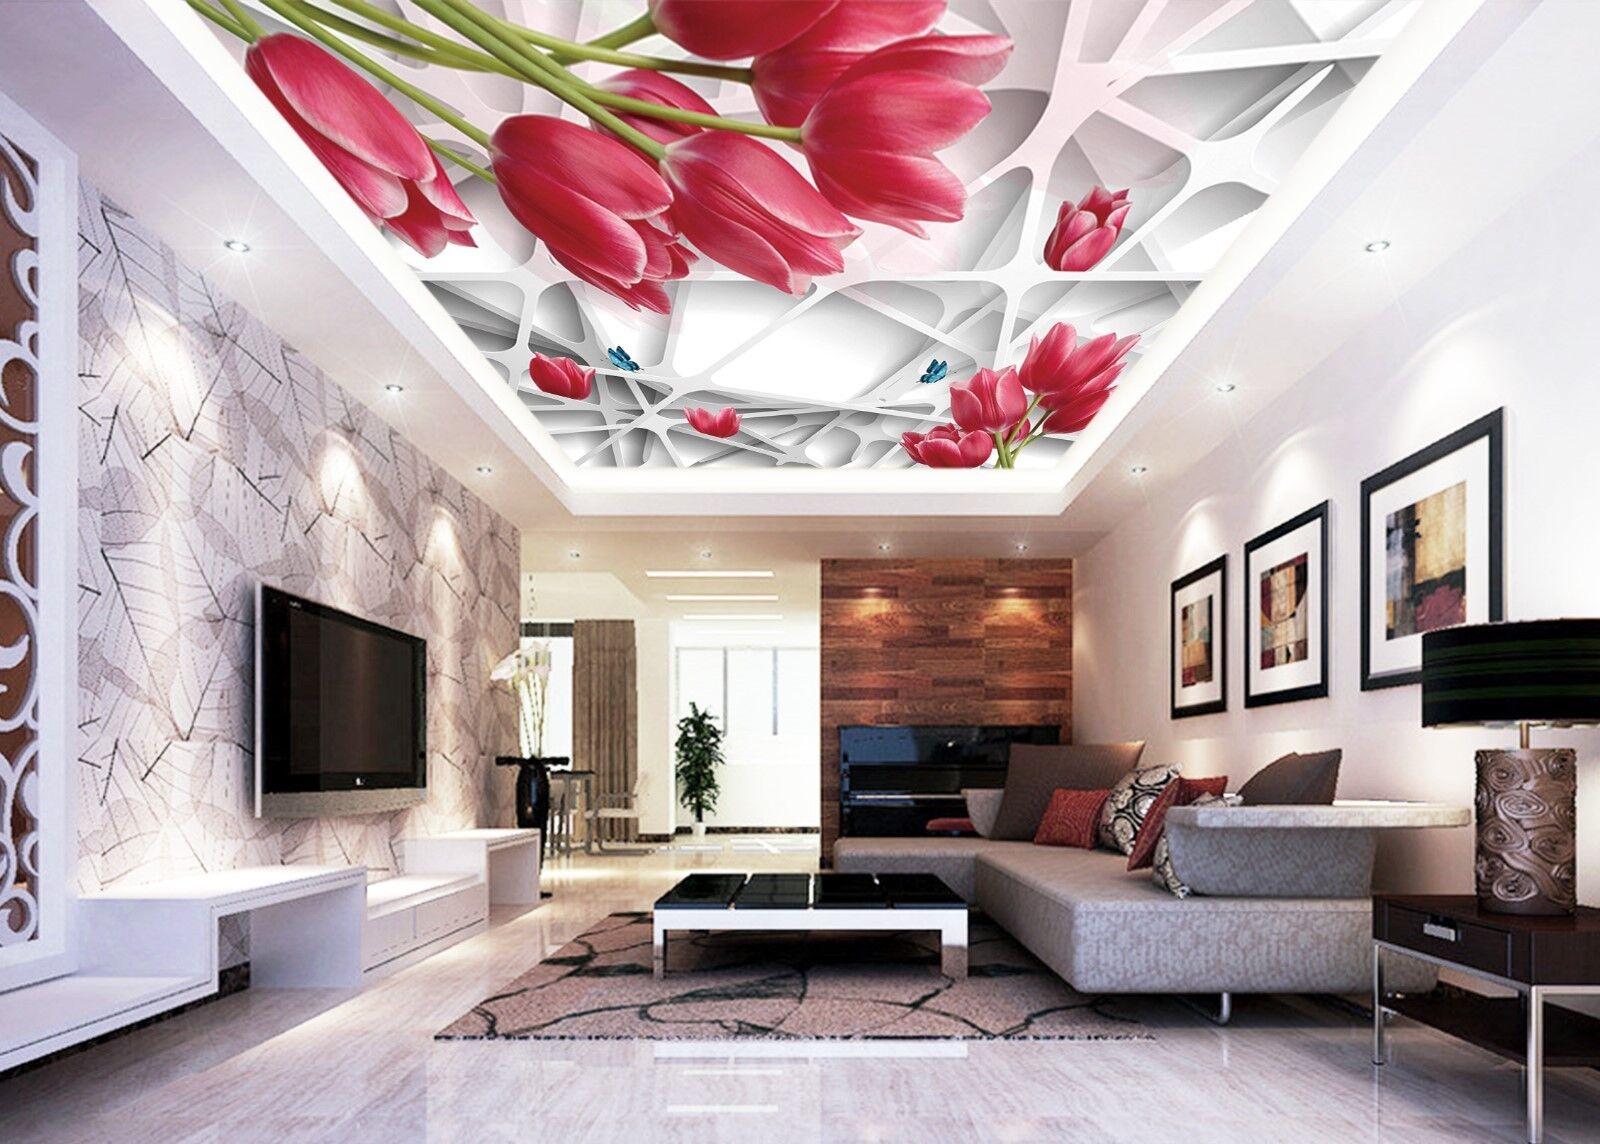 3D ROT Tulip Rahmen 8 Fototapeten Wandbild Fototapete BildTapete Familie DE Kyra